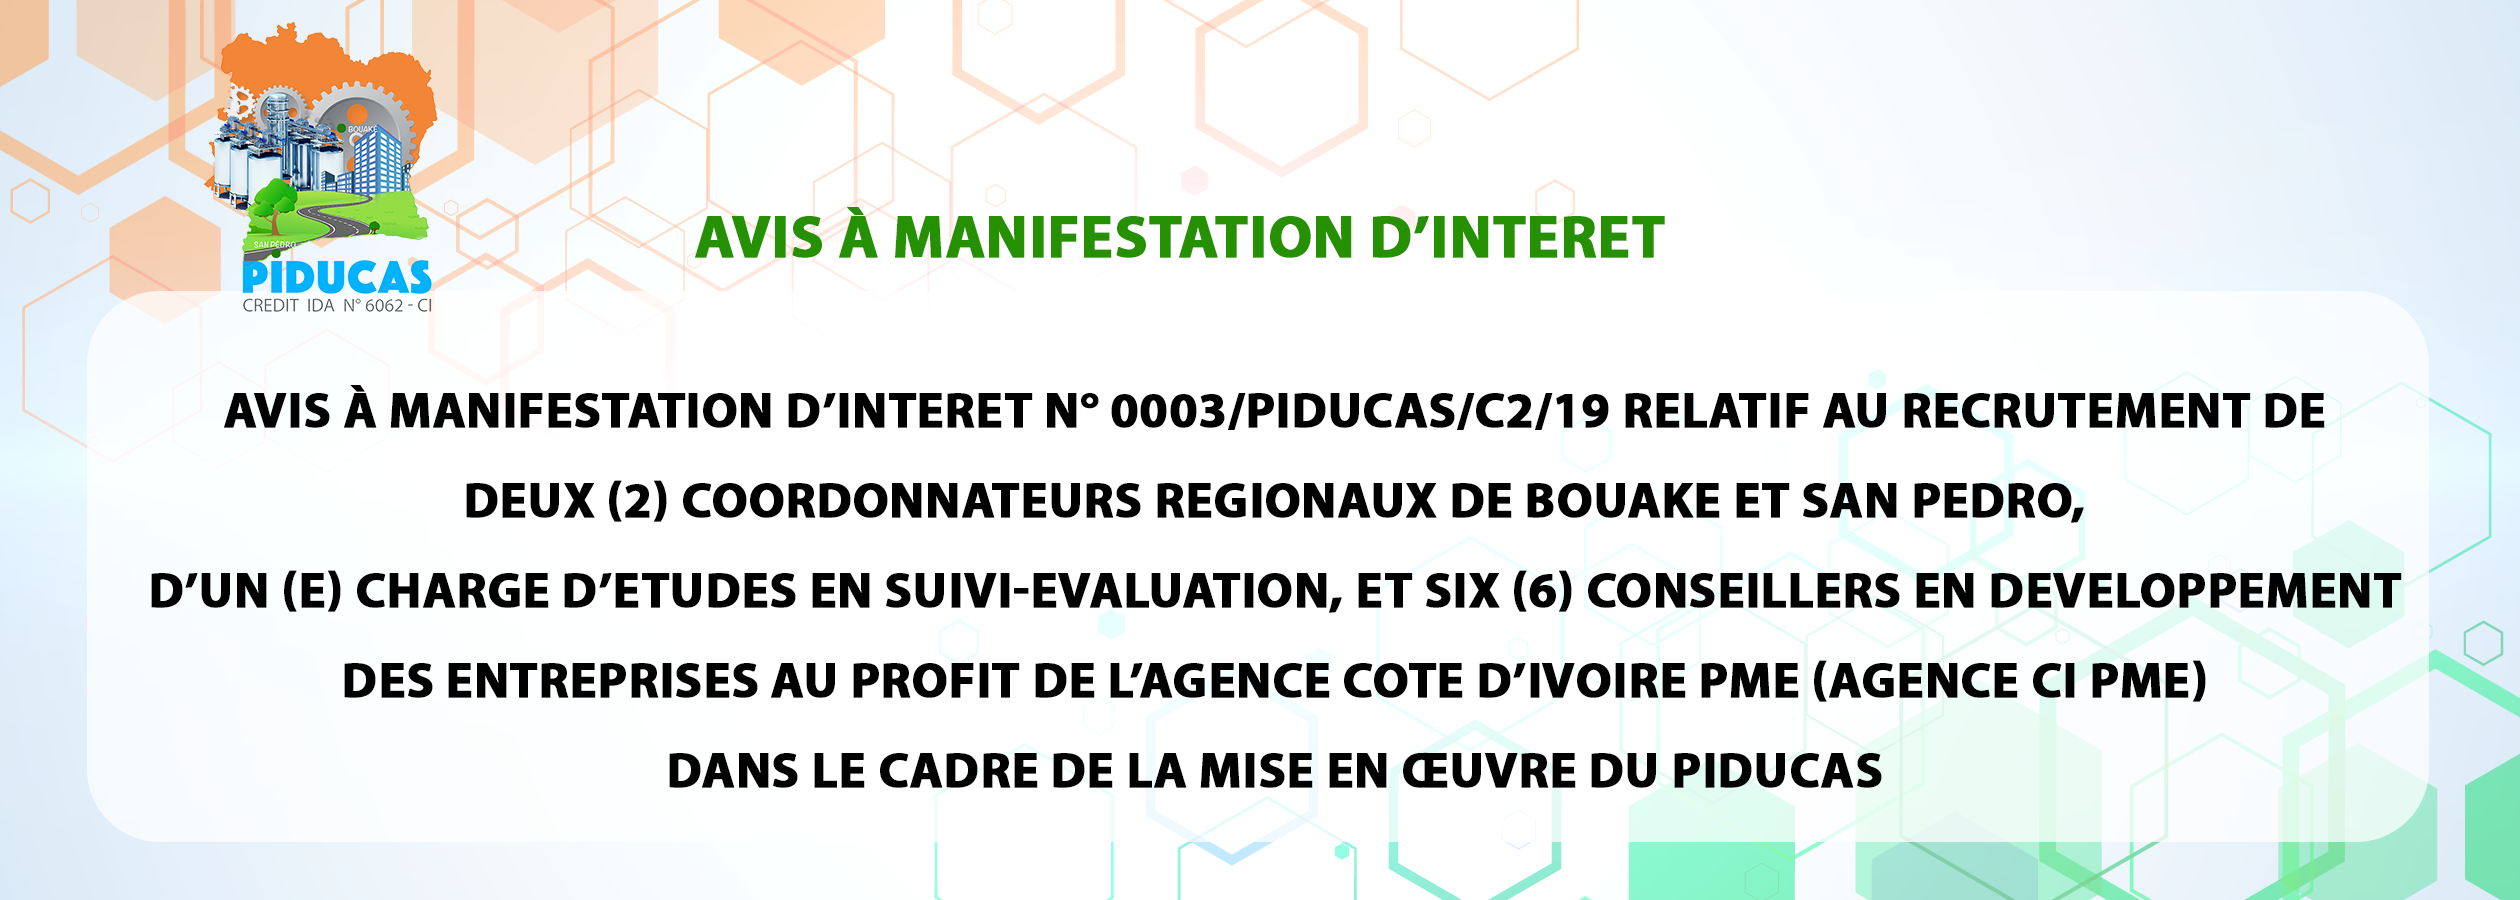 Banniere_PIDUCAS_0819